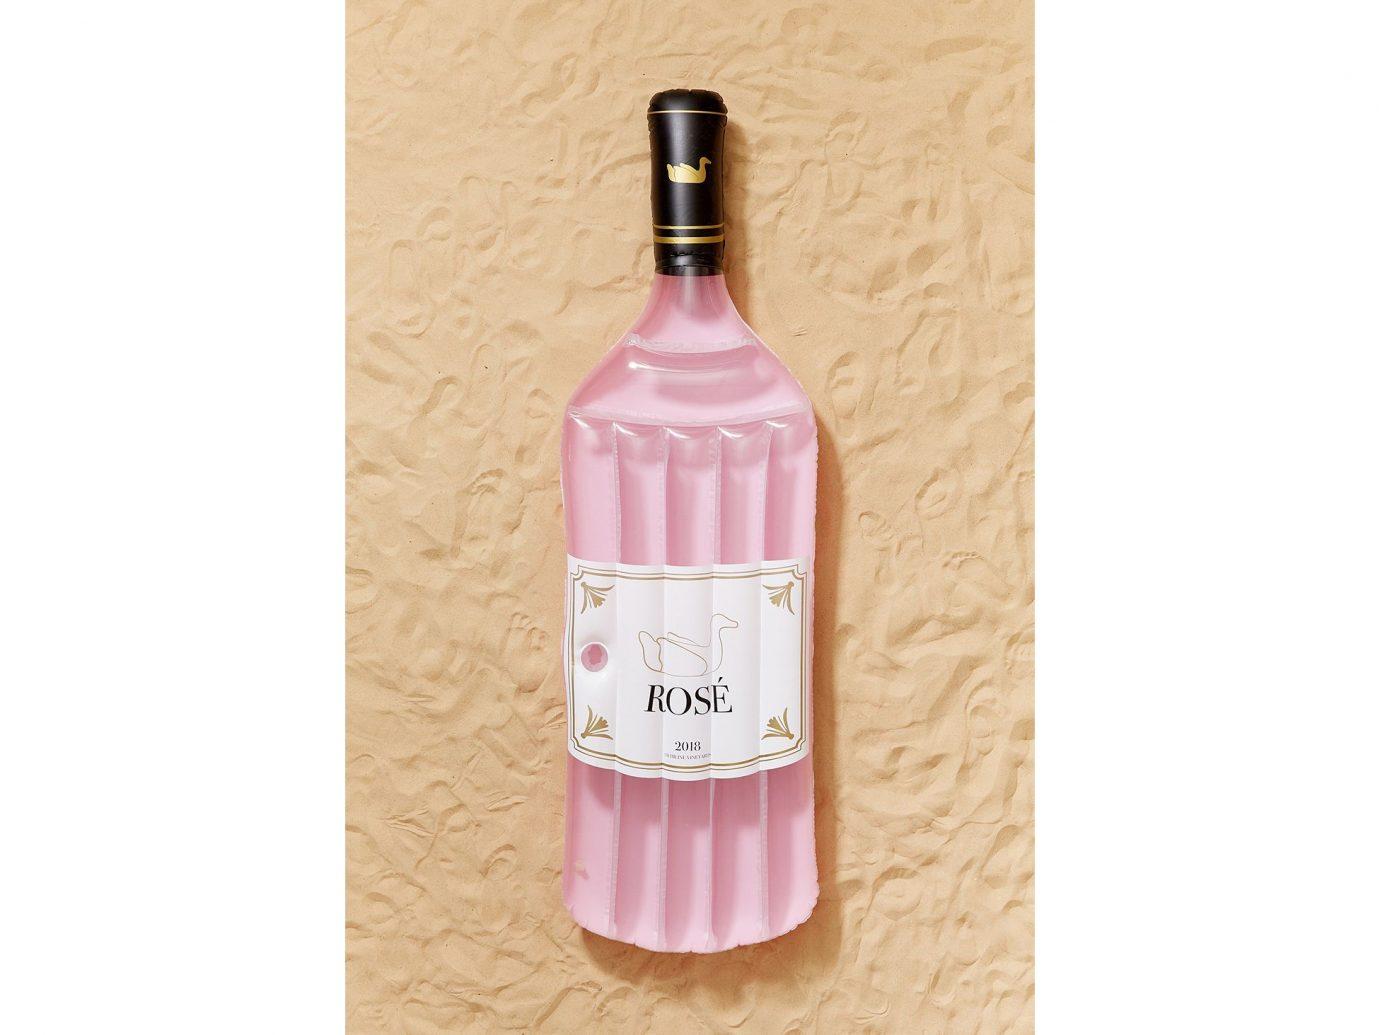 Rosé Bottle Pool Float